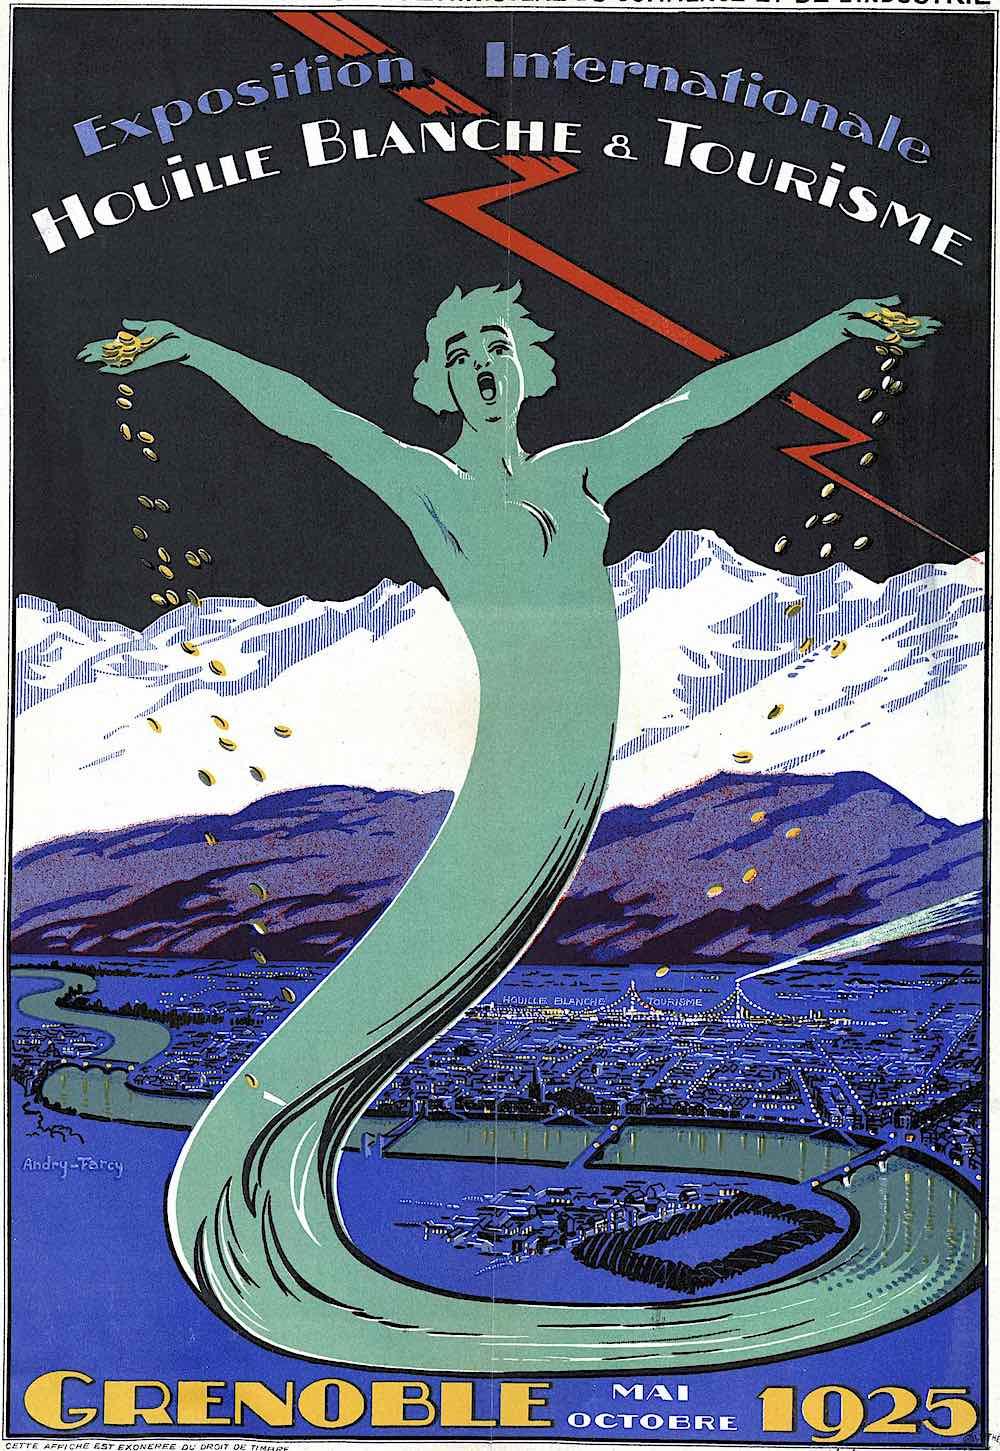 1925 Grenoble Exposition Internationale